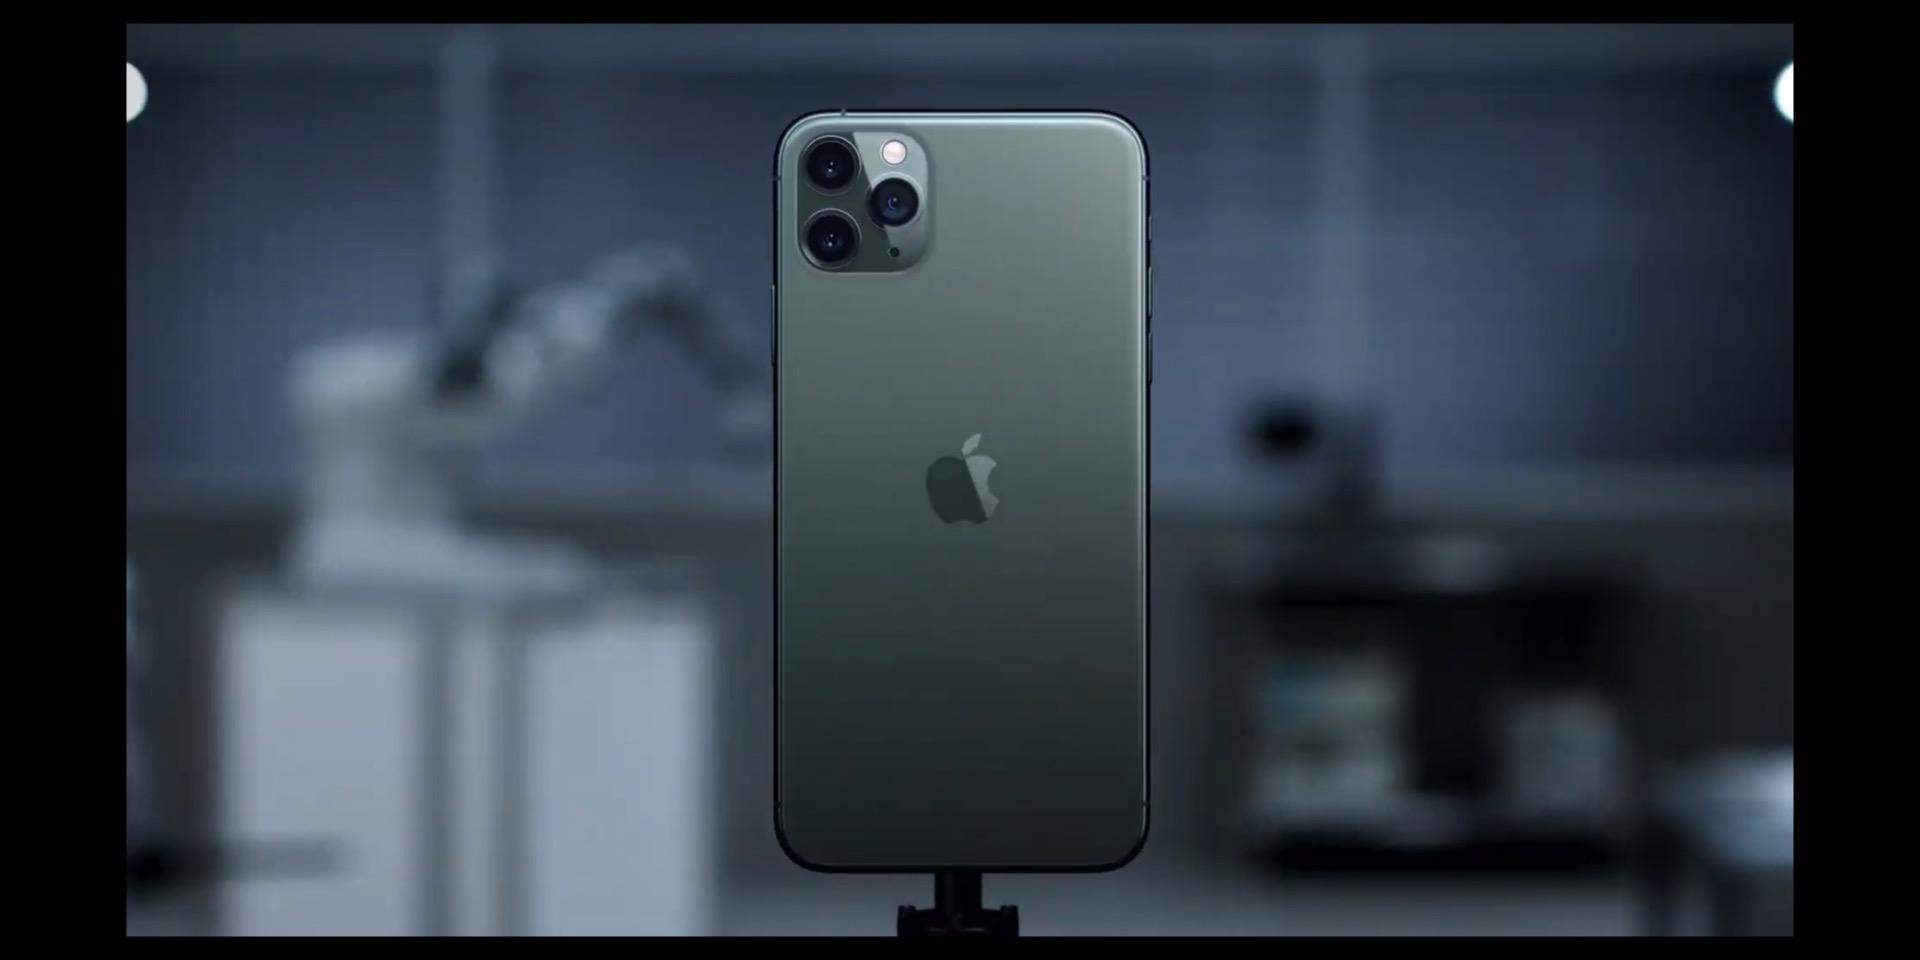 iPhone 11 Features, Release Date, Price, Cameras, etc